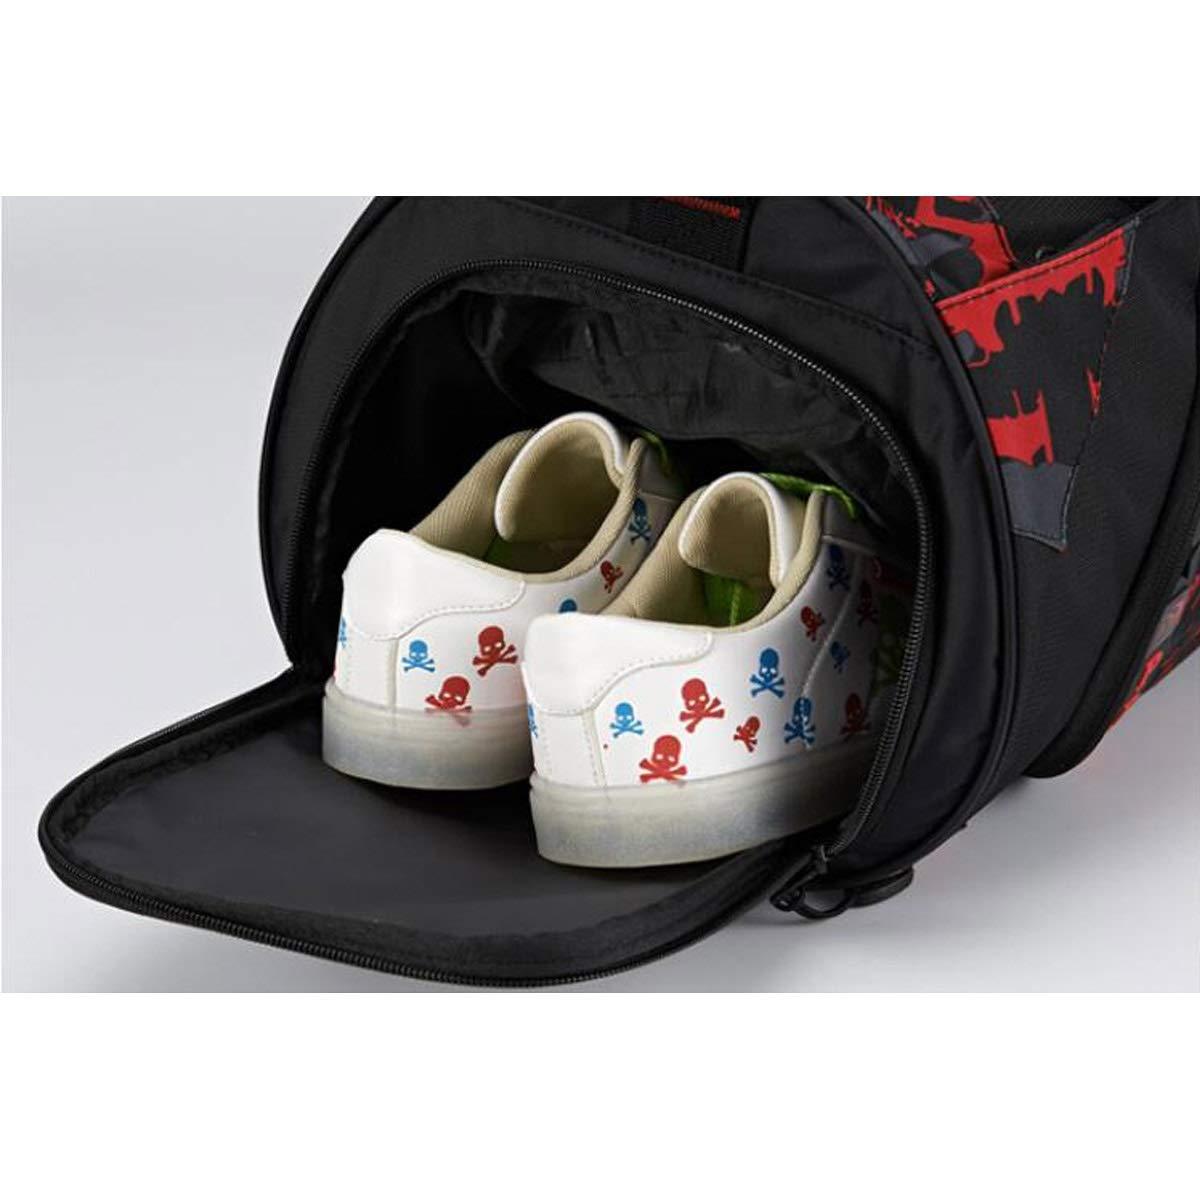 Large Size: 502626cm Safety Wet and Dry Separation Waterproof Gym Bag Mens and Womens Shoulder Bag Crossbody Portable Training Bag Large-Capacity Travel Bag Hongyuantongxun Sports Bag